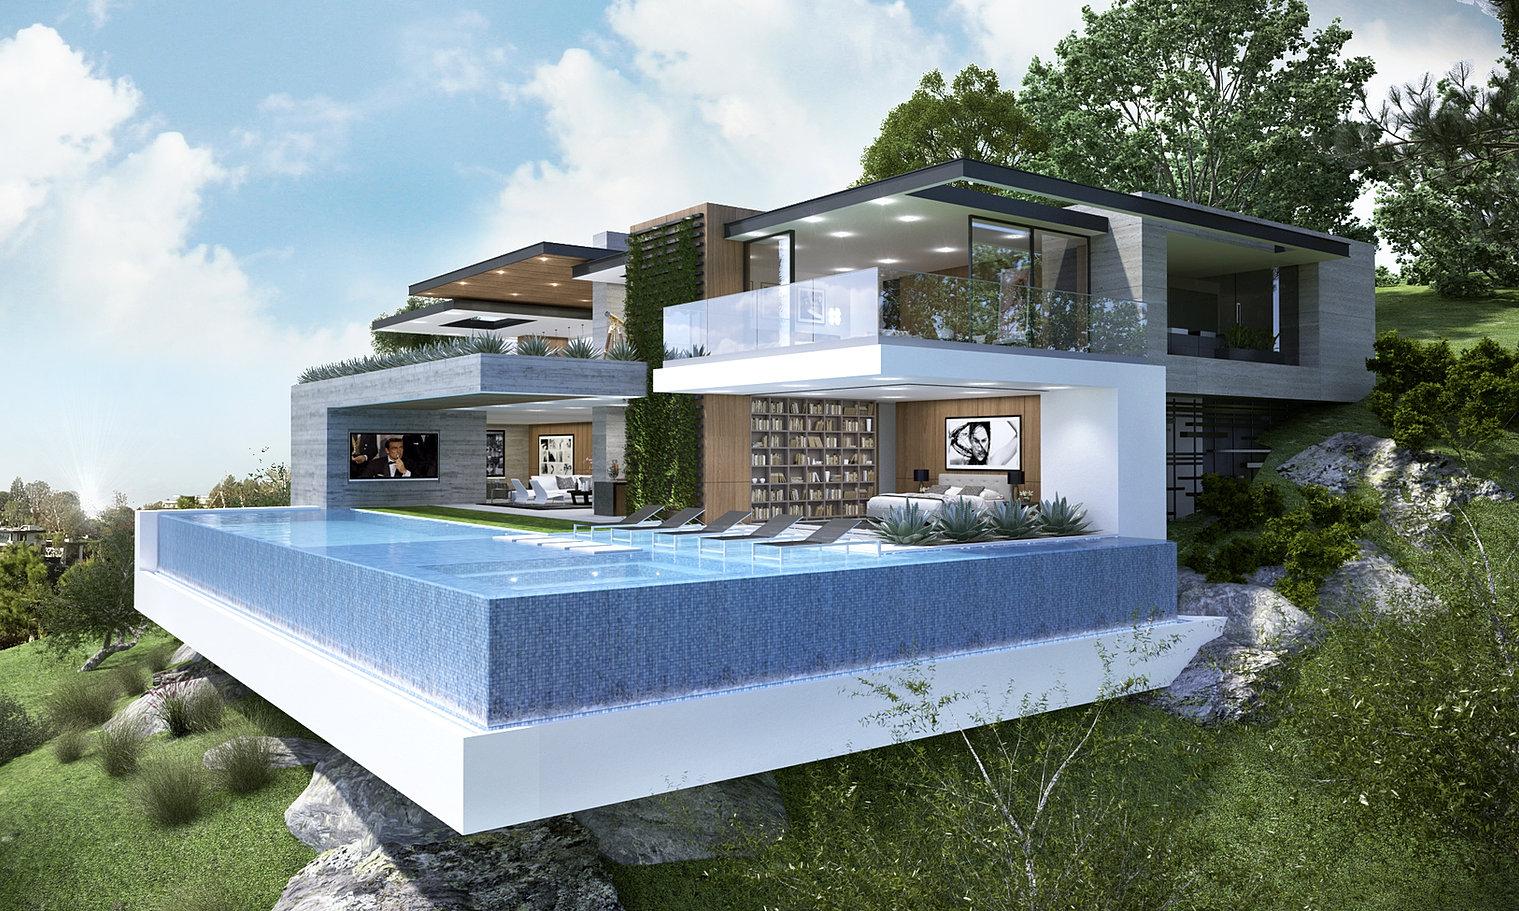 Edgewater Model Weber Design Group Mediterranean Home Plans - Caribbean homes designs